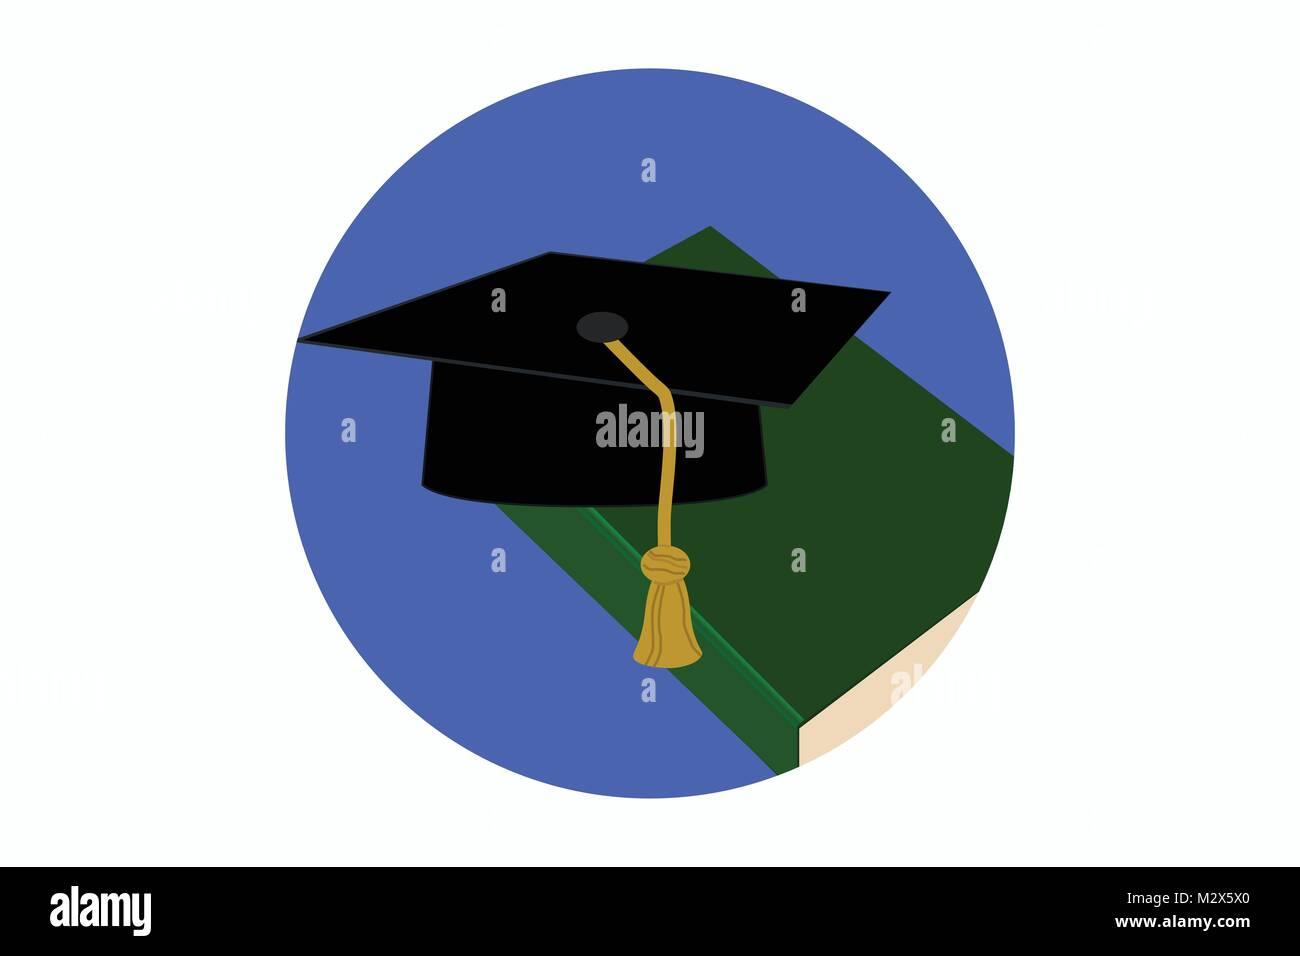 Academic icon, university icon, PhD icon, symbol for higher education, illustration of studies, studying icon, academic - Stock Image